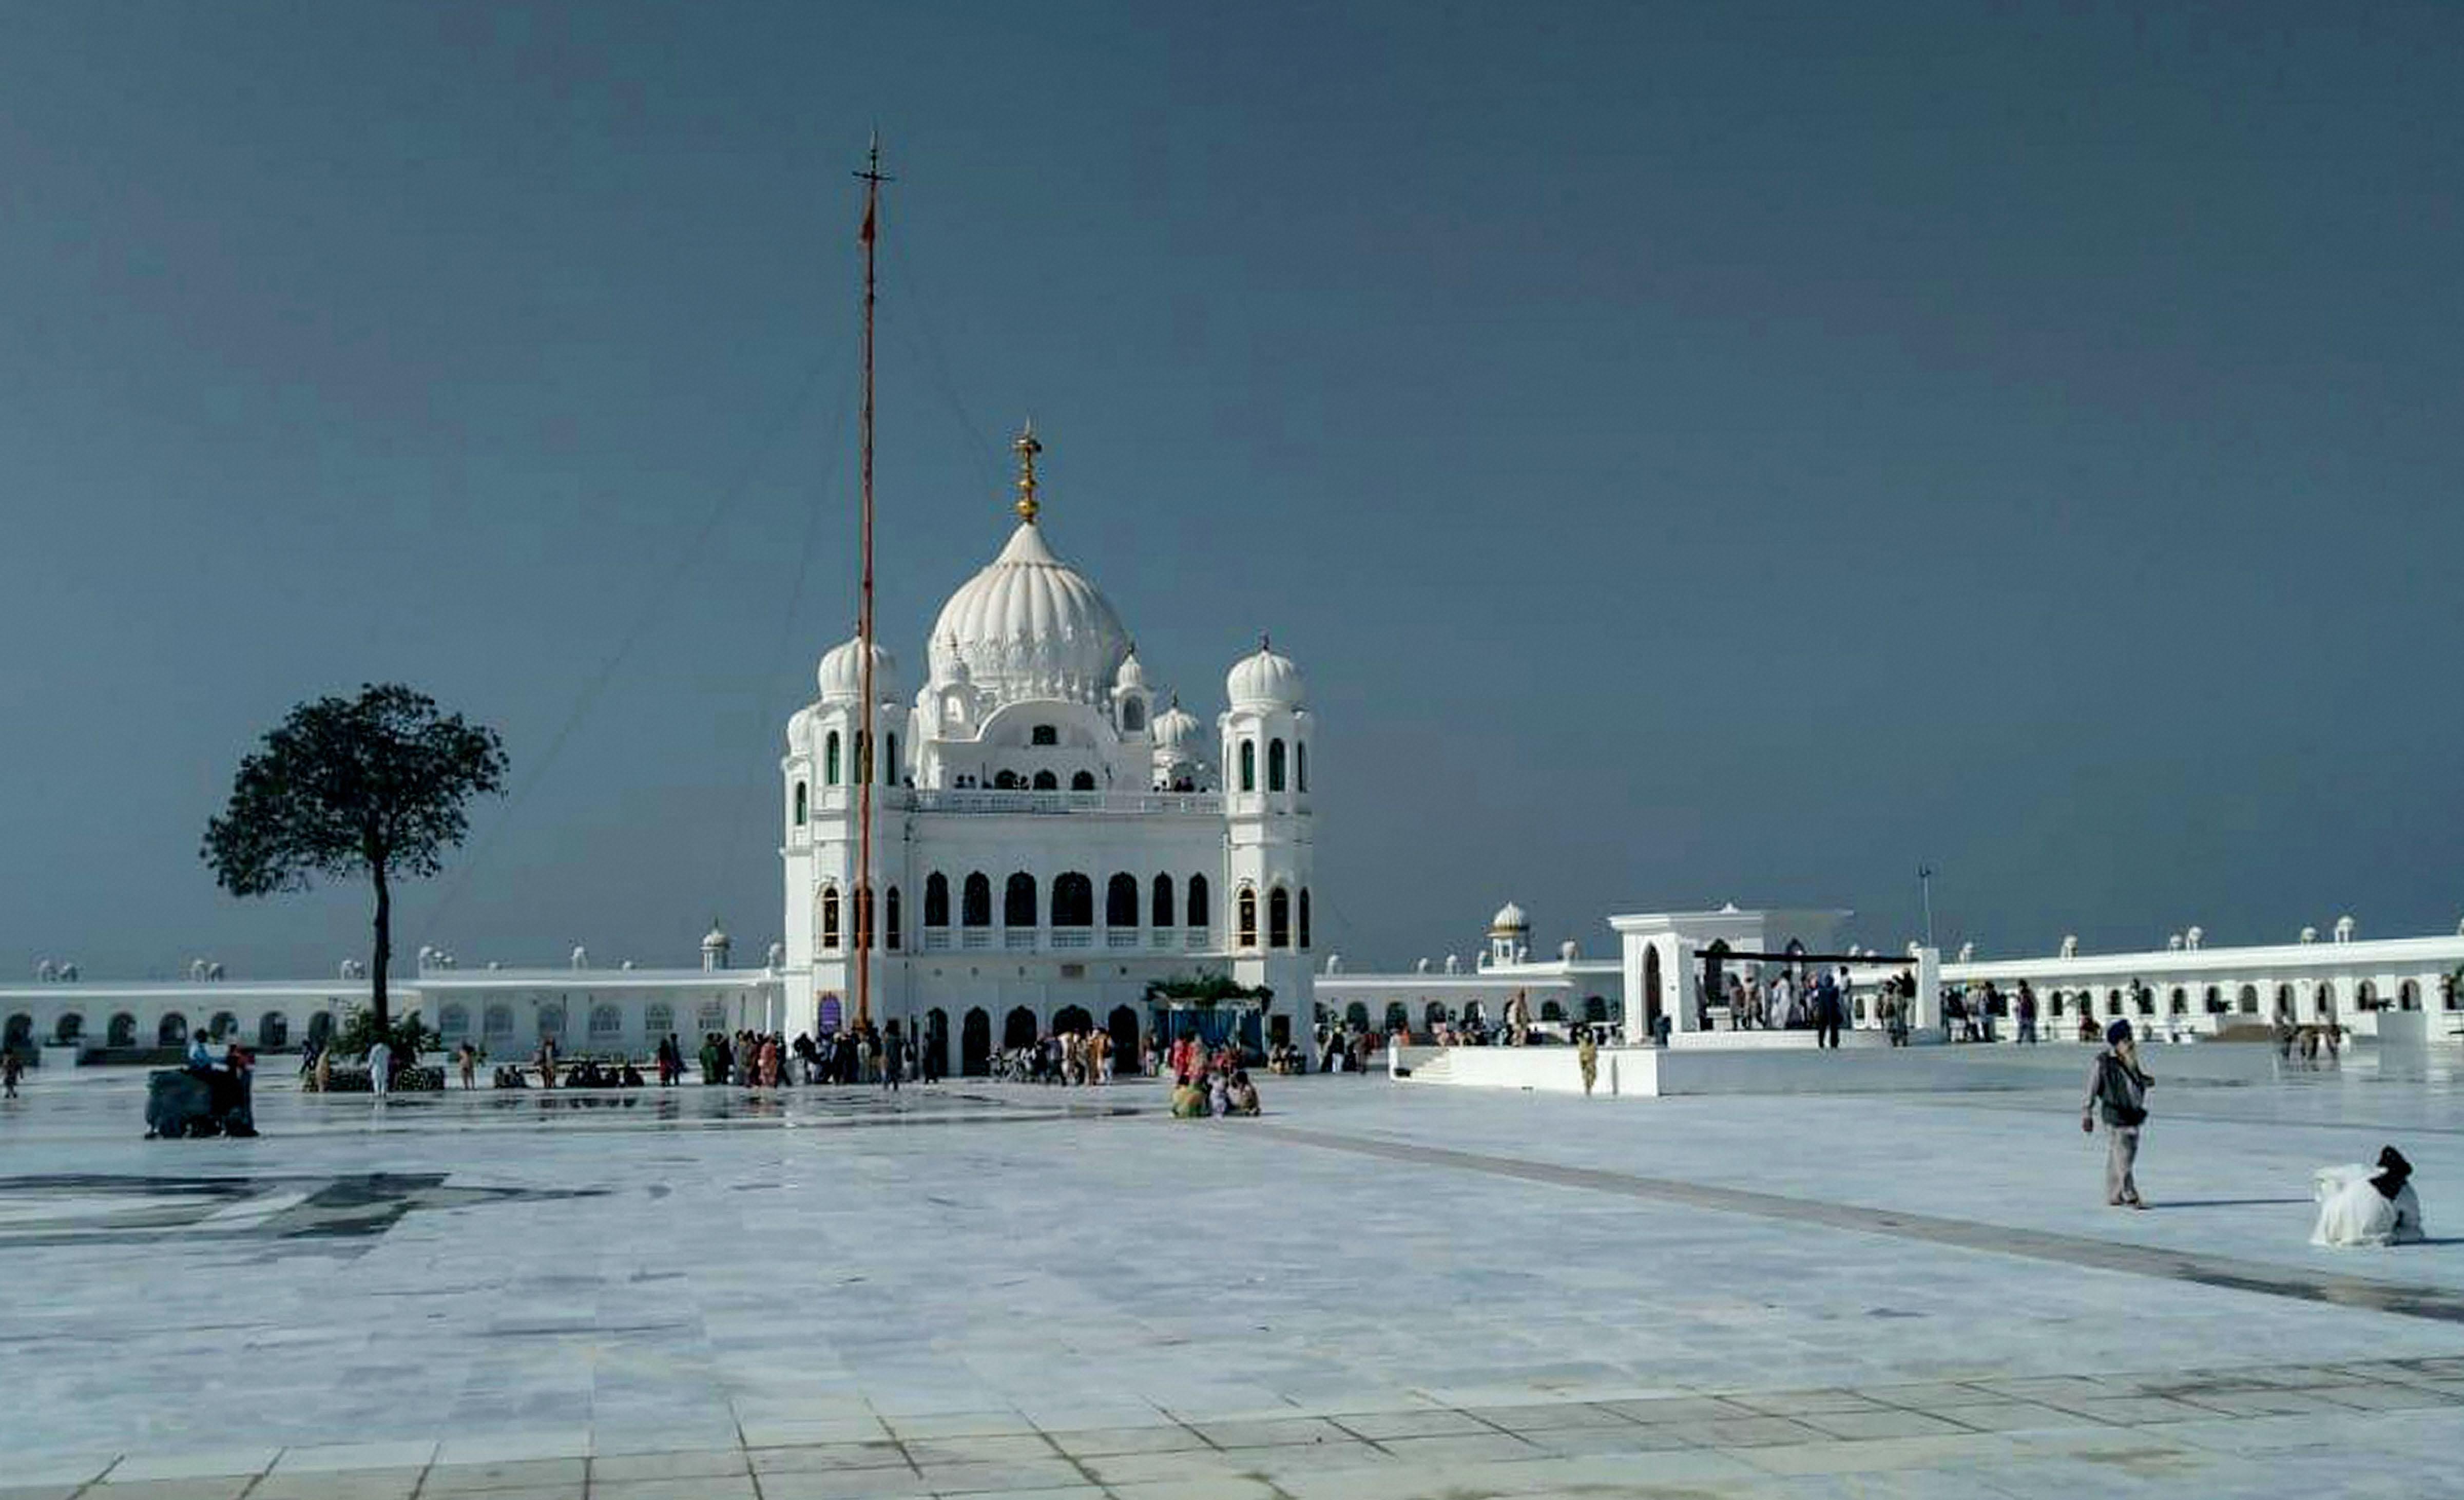 Coronavirus Lockdown: Pakistan reopens Kartarpur Corridor, but no visitor  from India | Deccan Herald